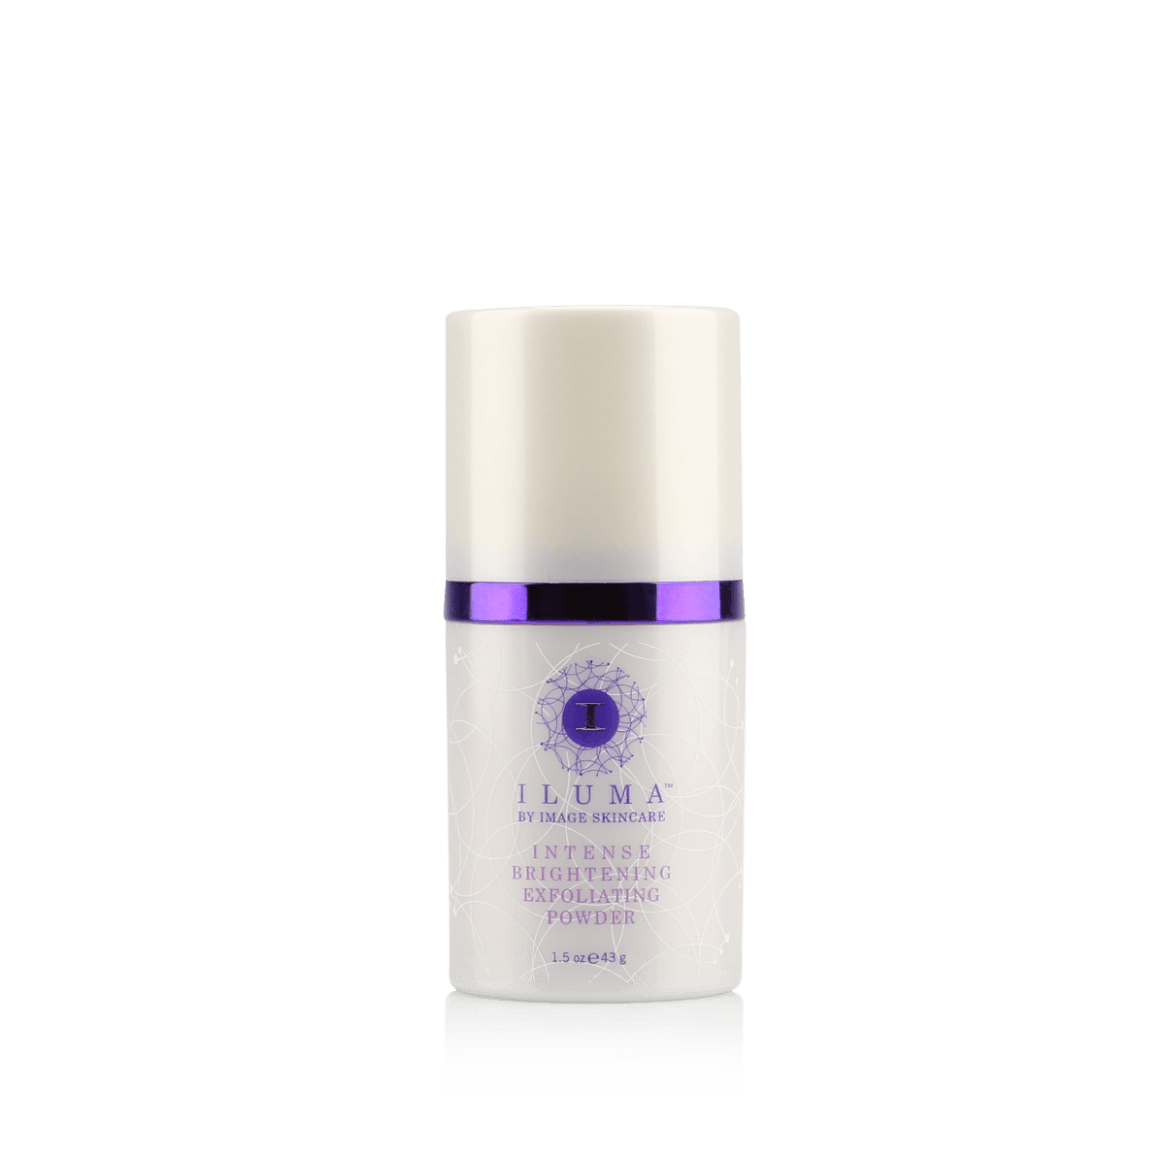 IMAGE Skincare ILUMA intense brightening exfoliating powder